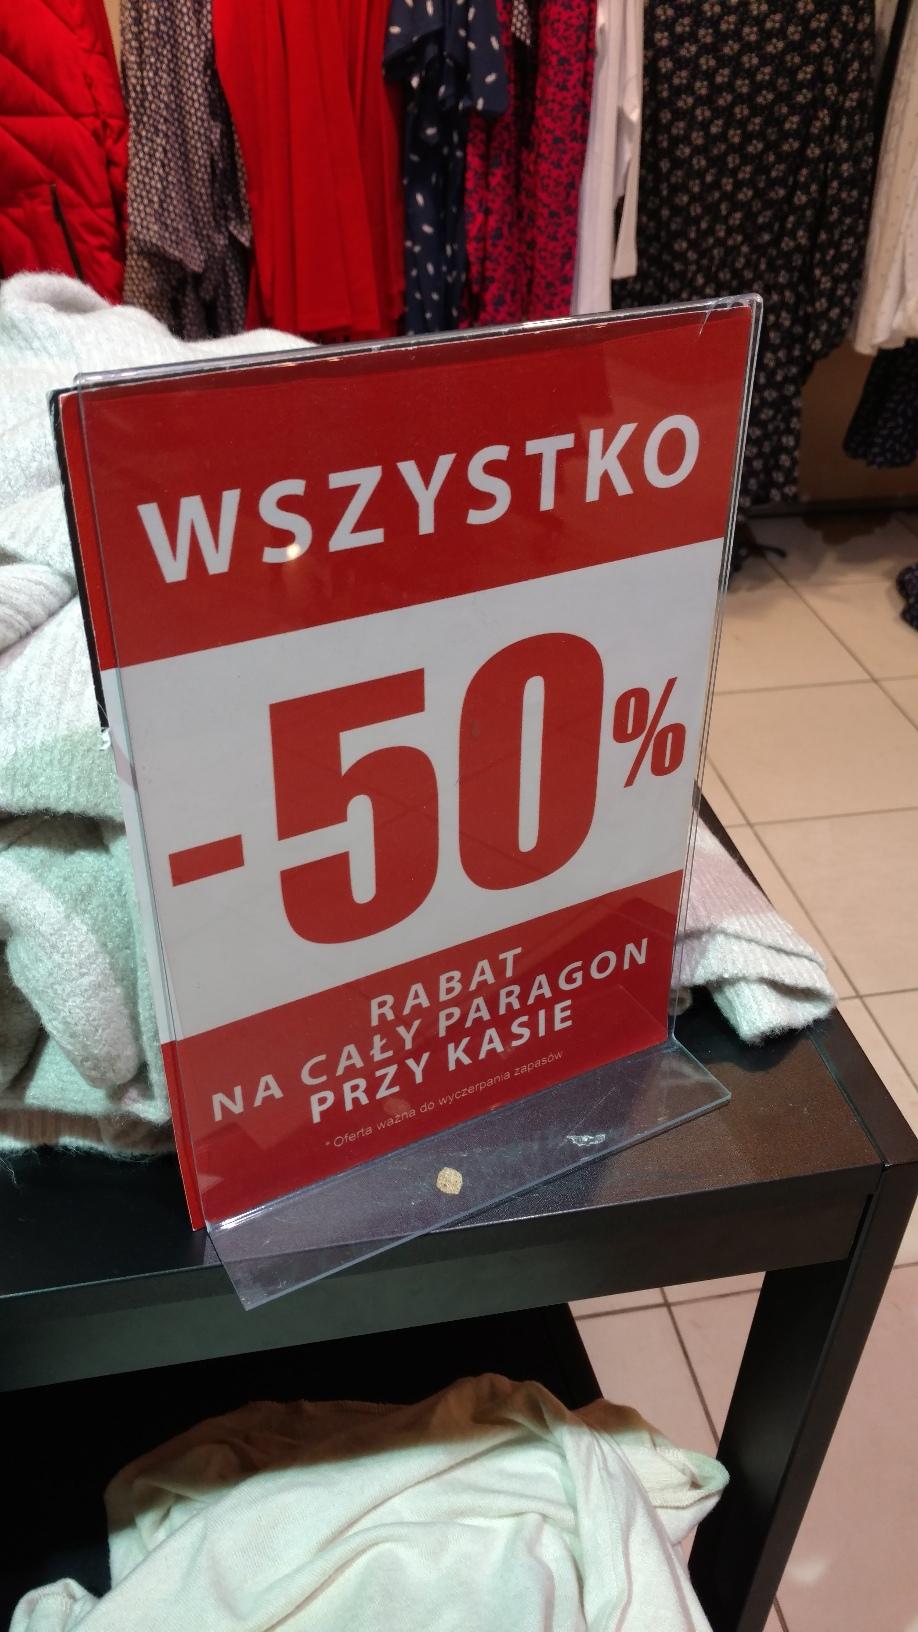 Carry -50% na cały rachunek - promocja ogólnopolska